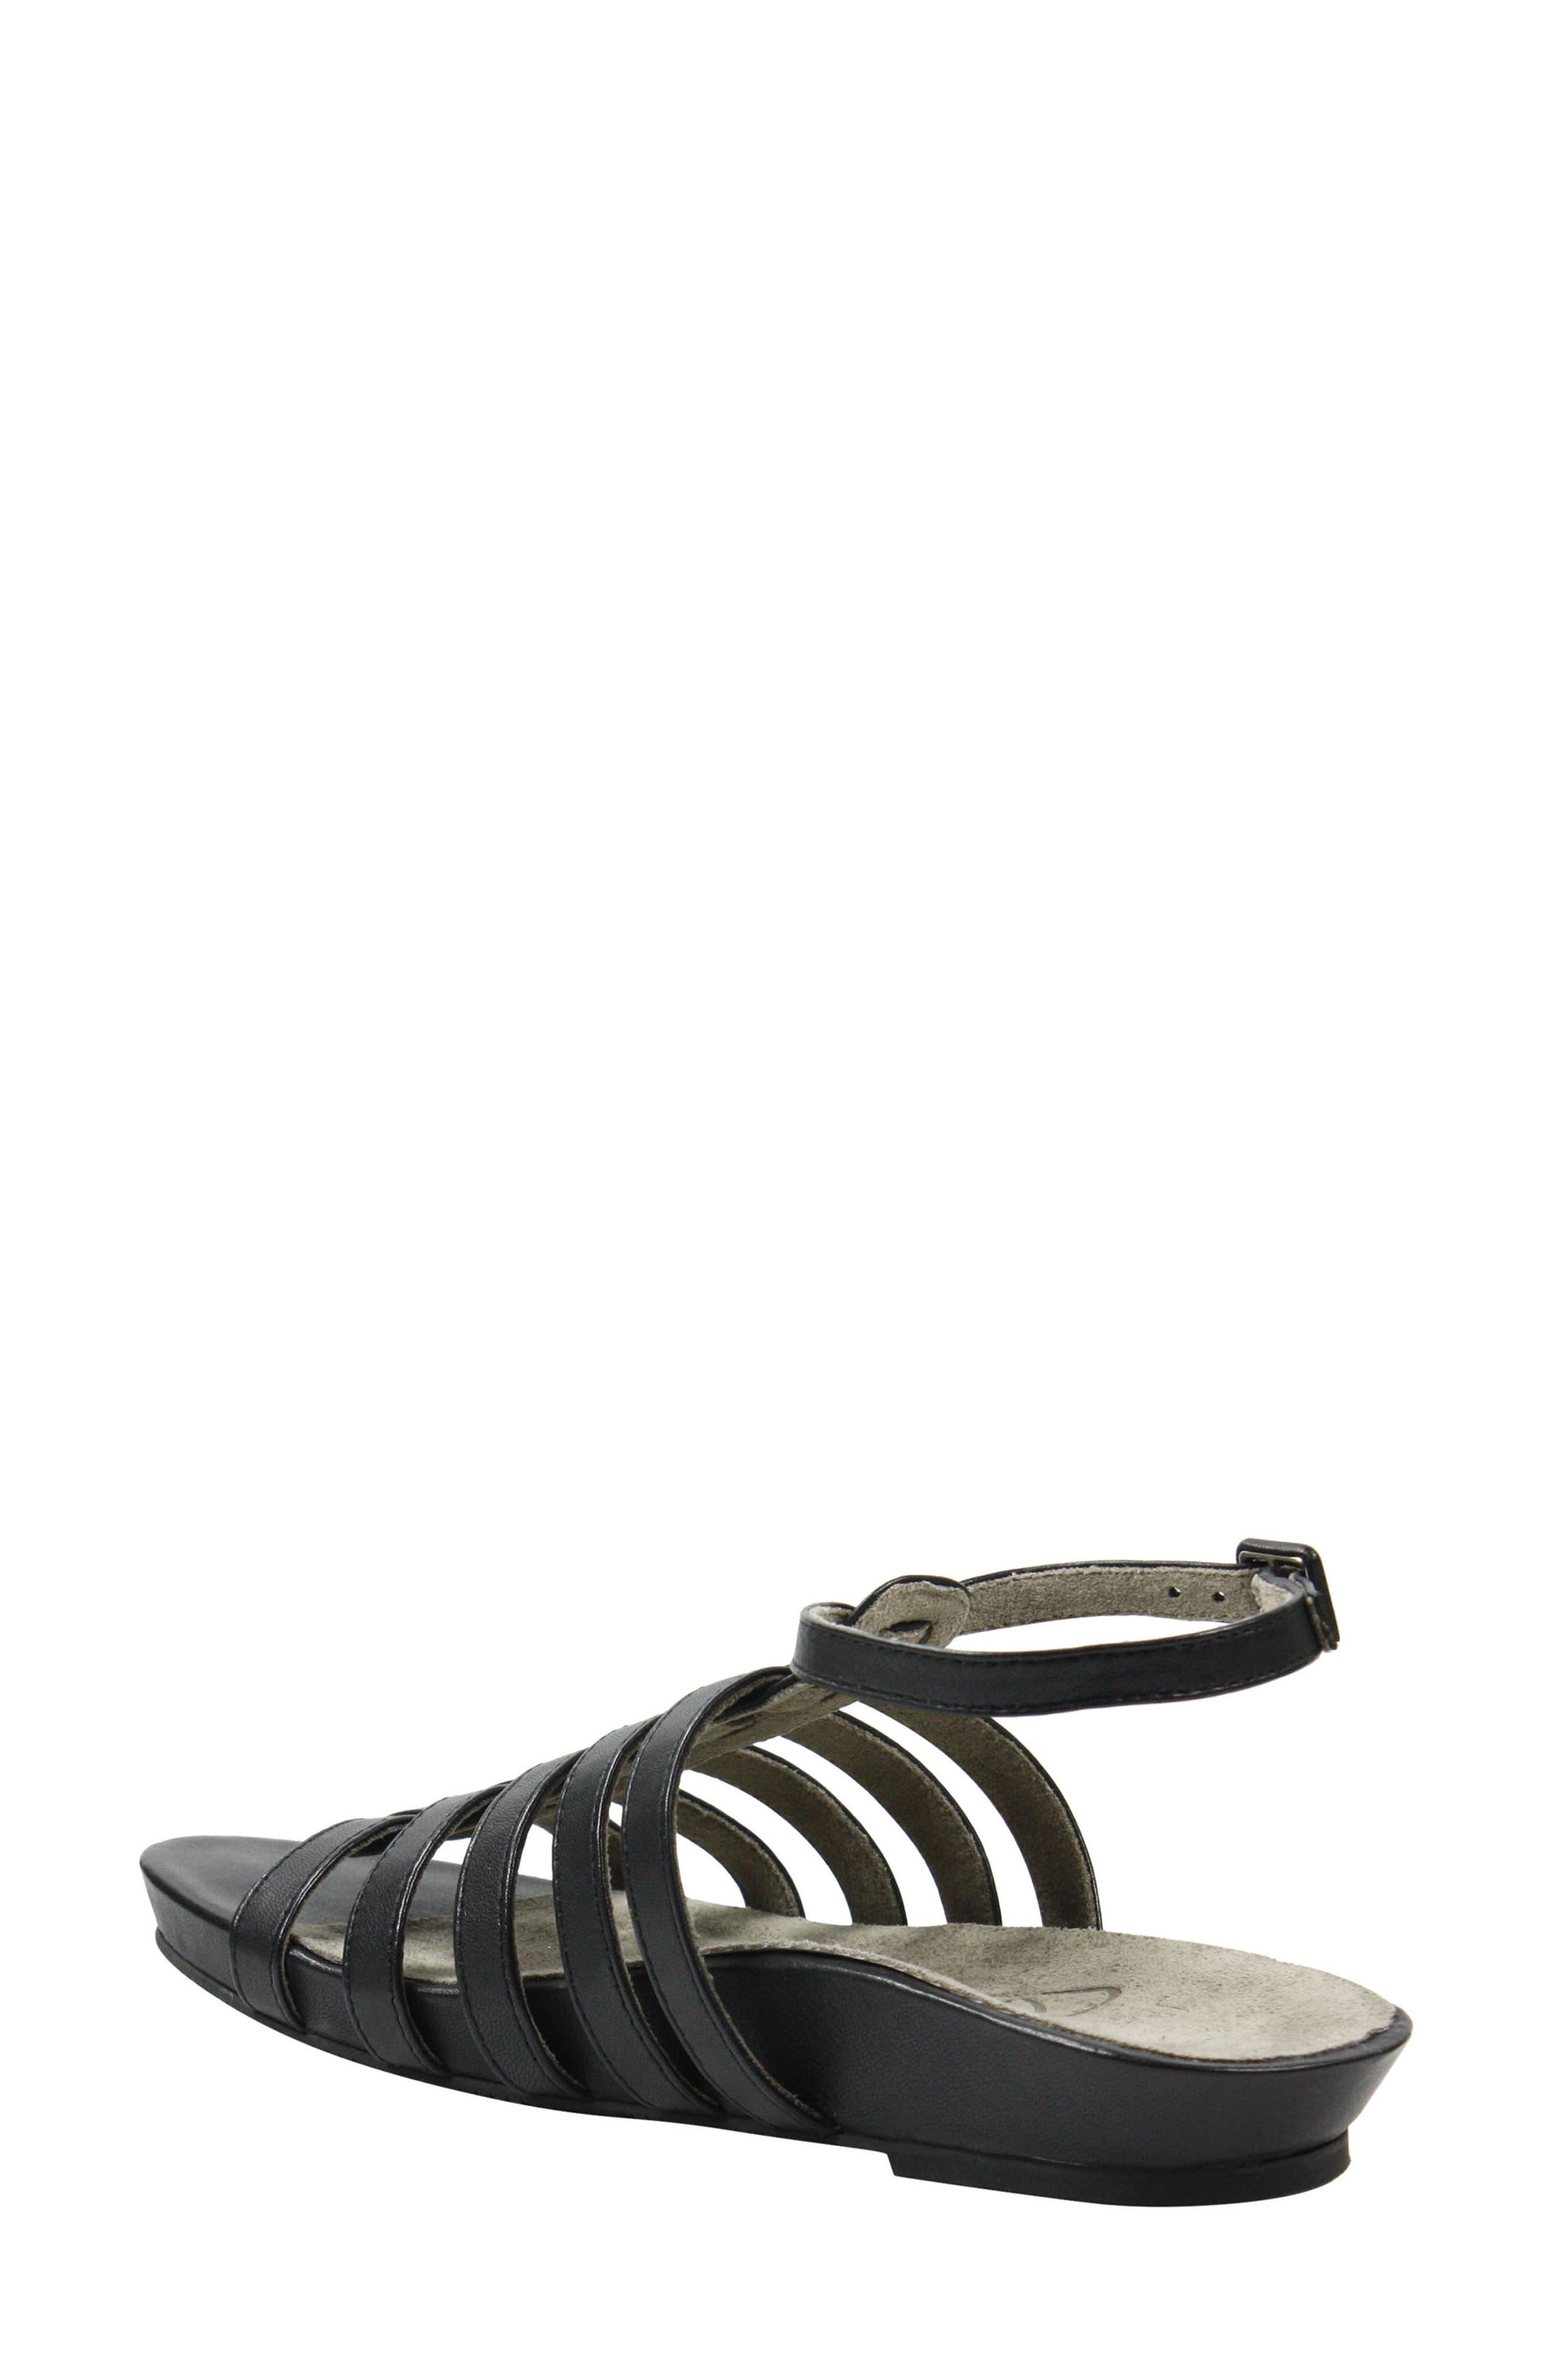 Delmor Ankle Strap Sandal,                             Alternate thumbnail 2, color,                             BLACK LEATHER